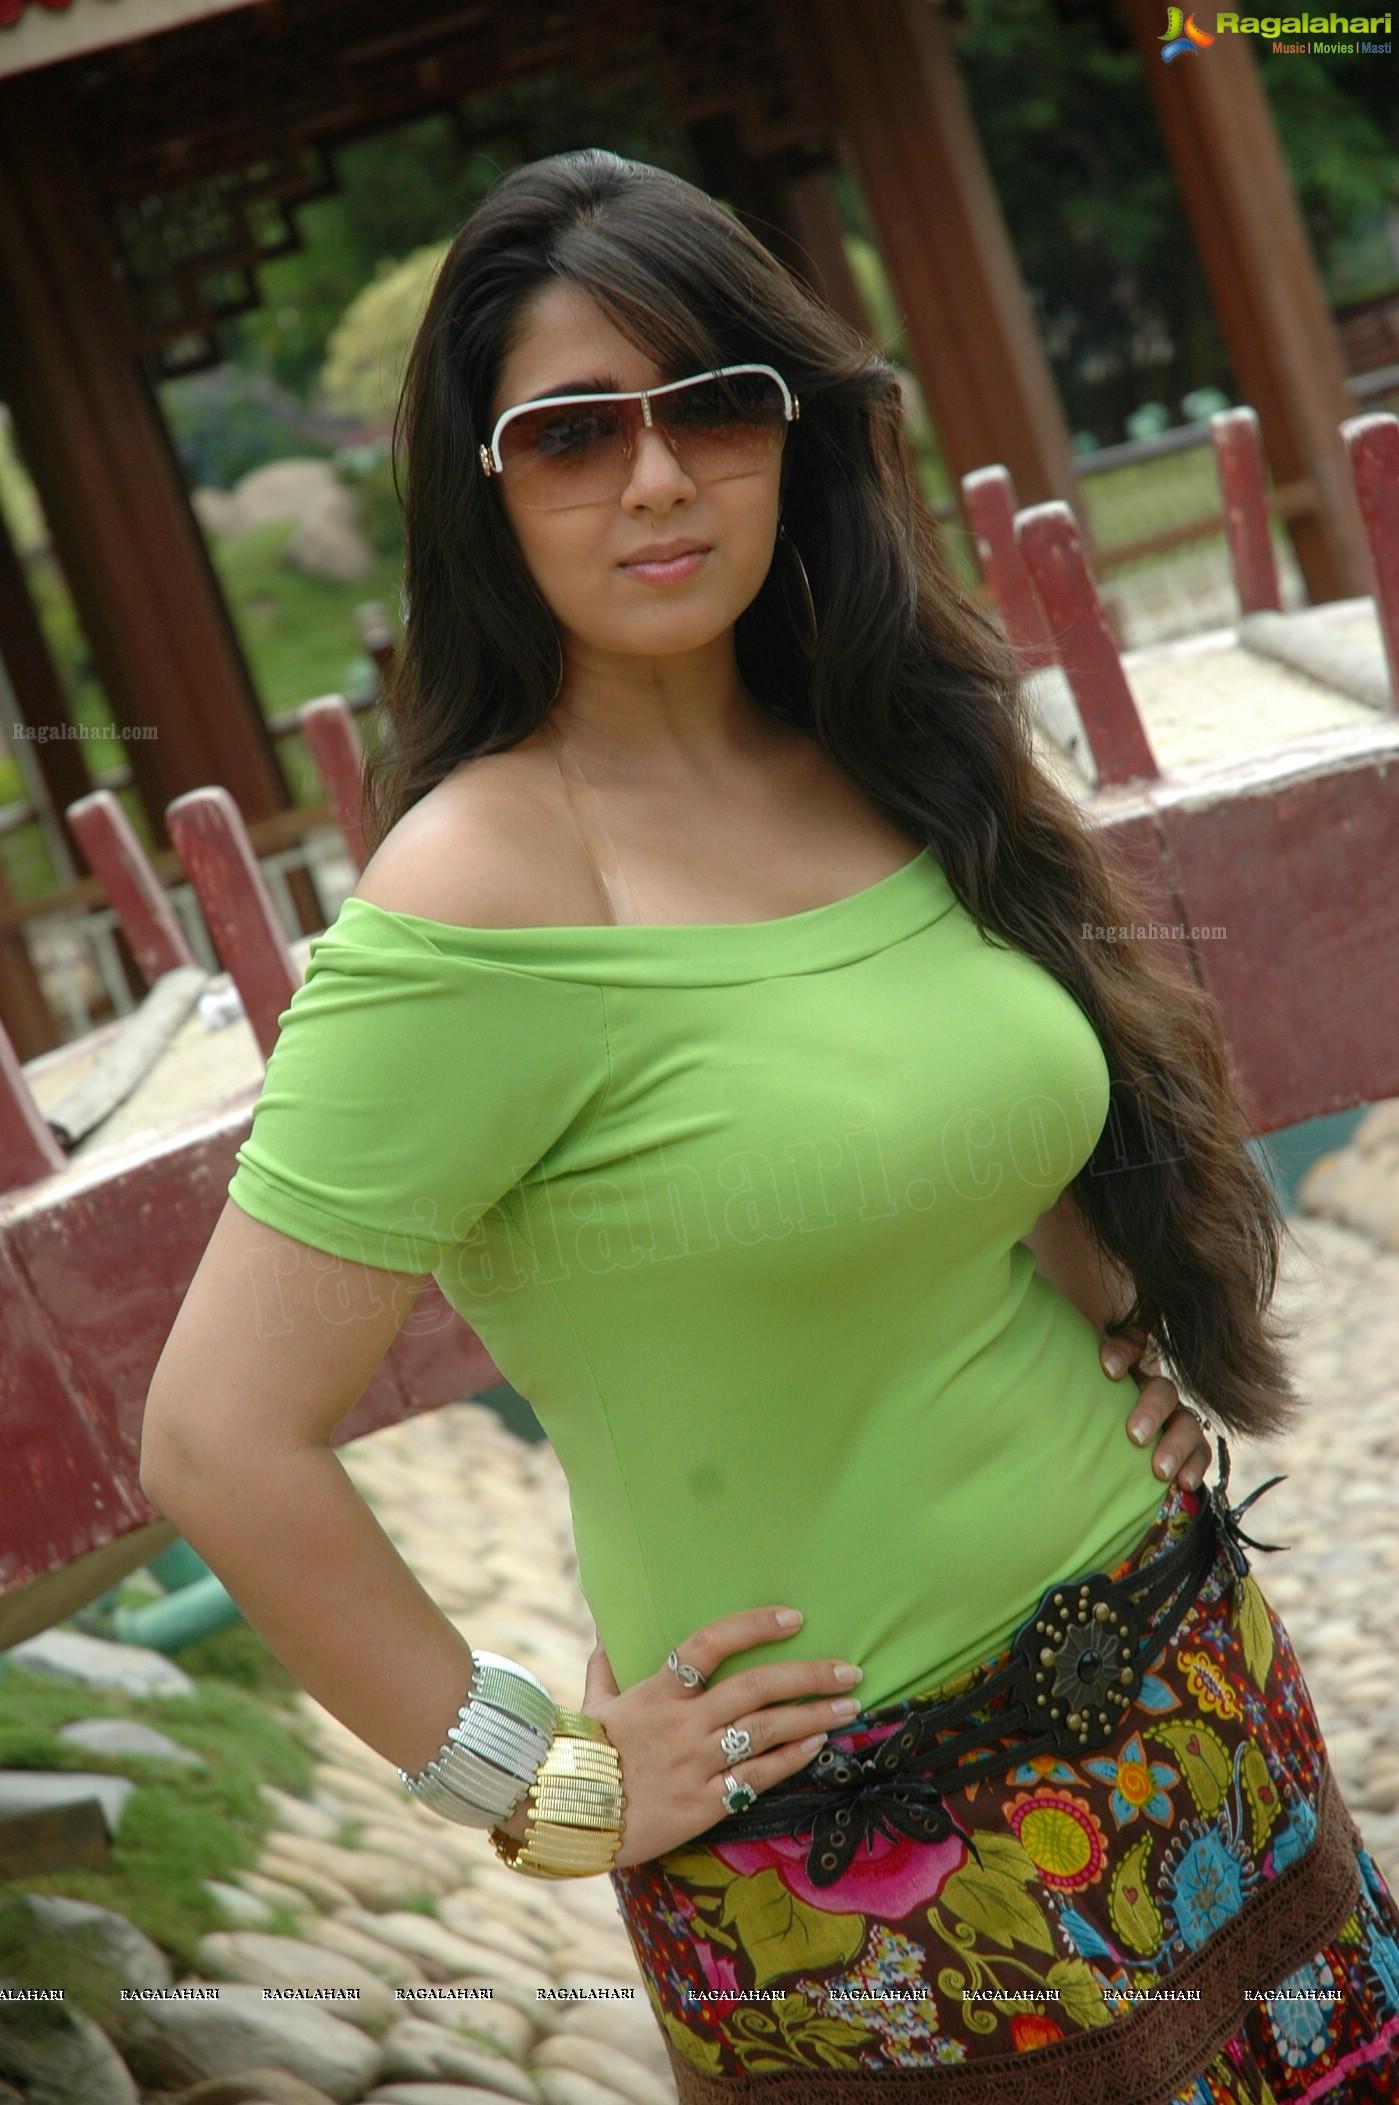 super hot charmi in saree - high resolution poster size photos